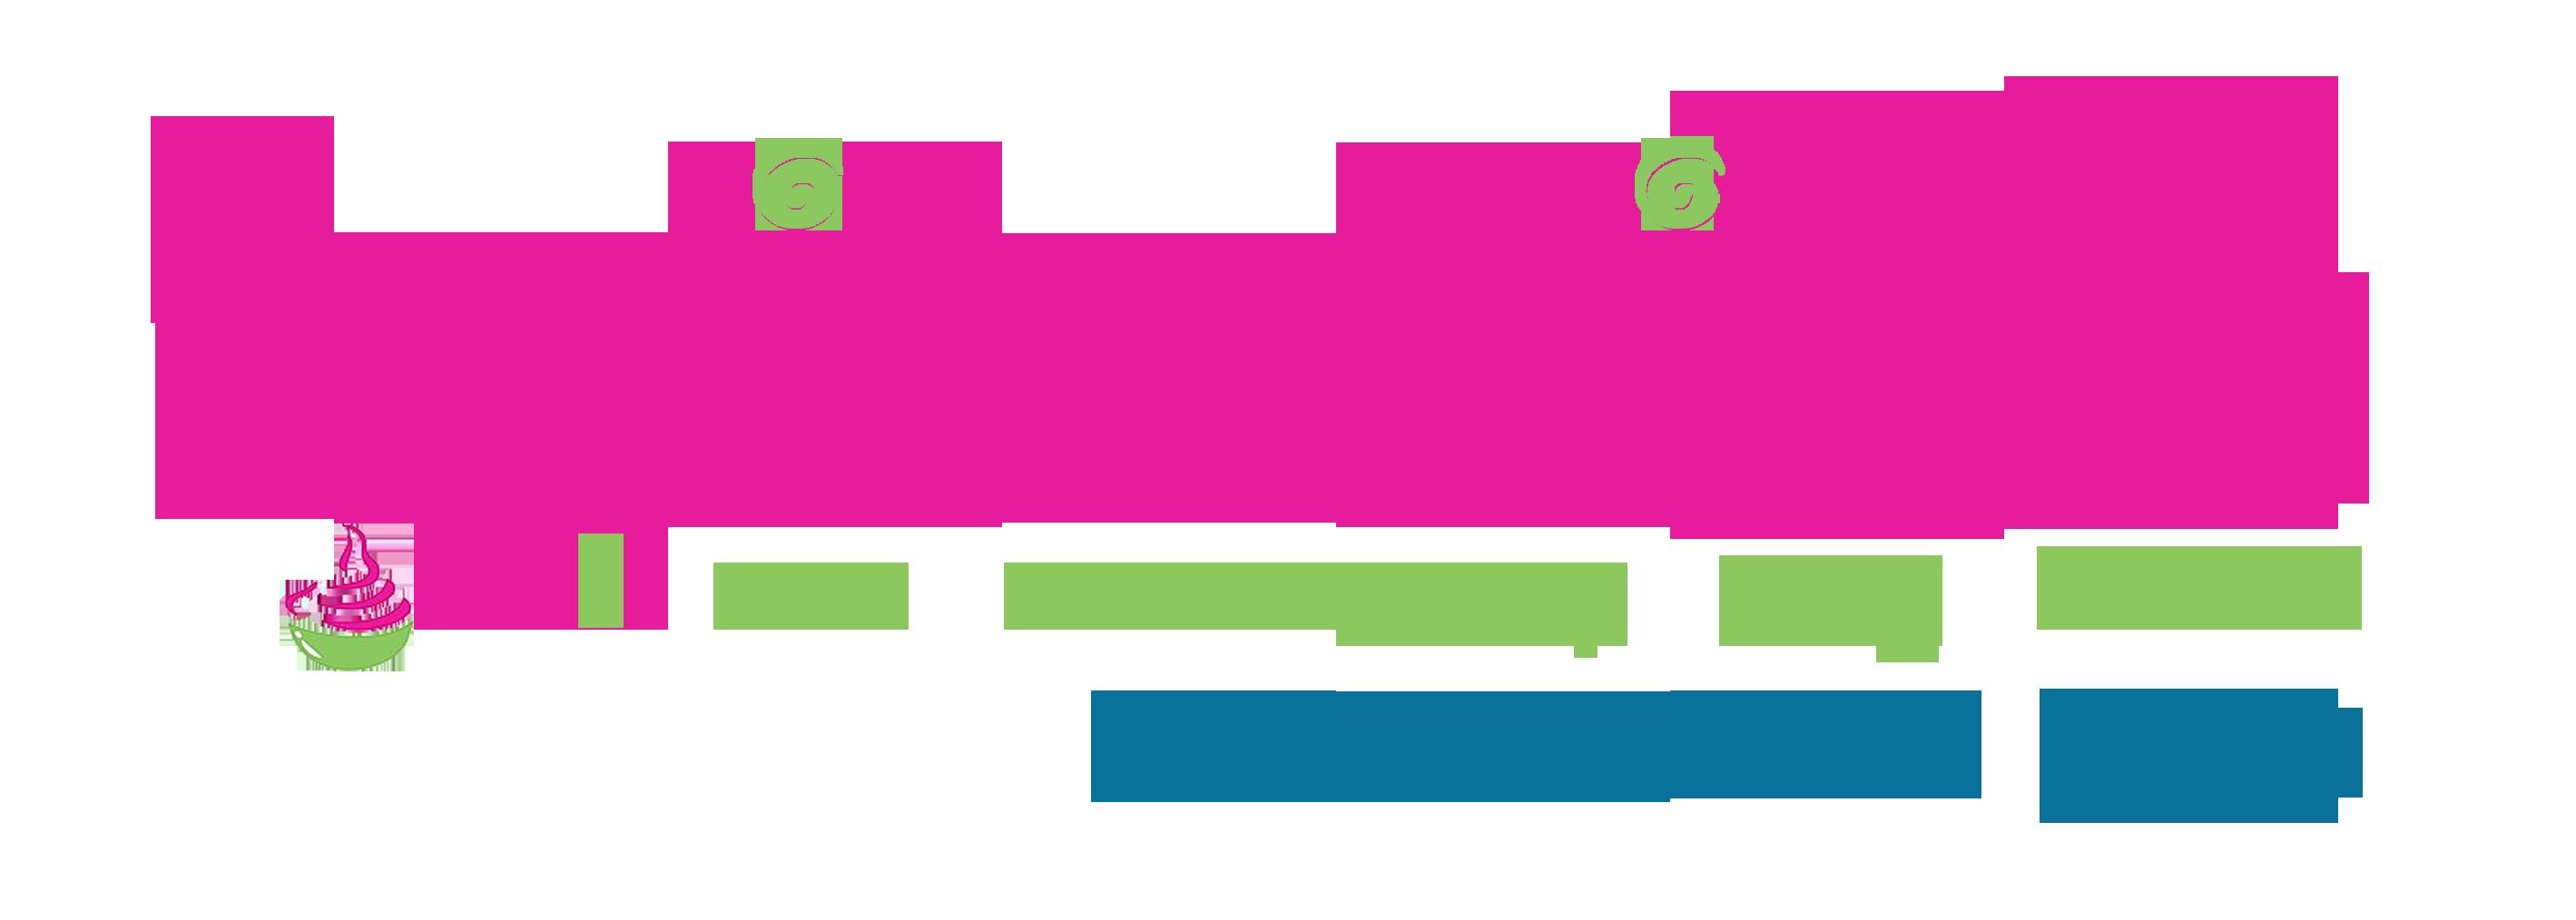 Spice Isle Frozen Yogurt